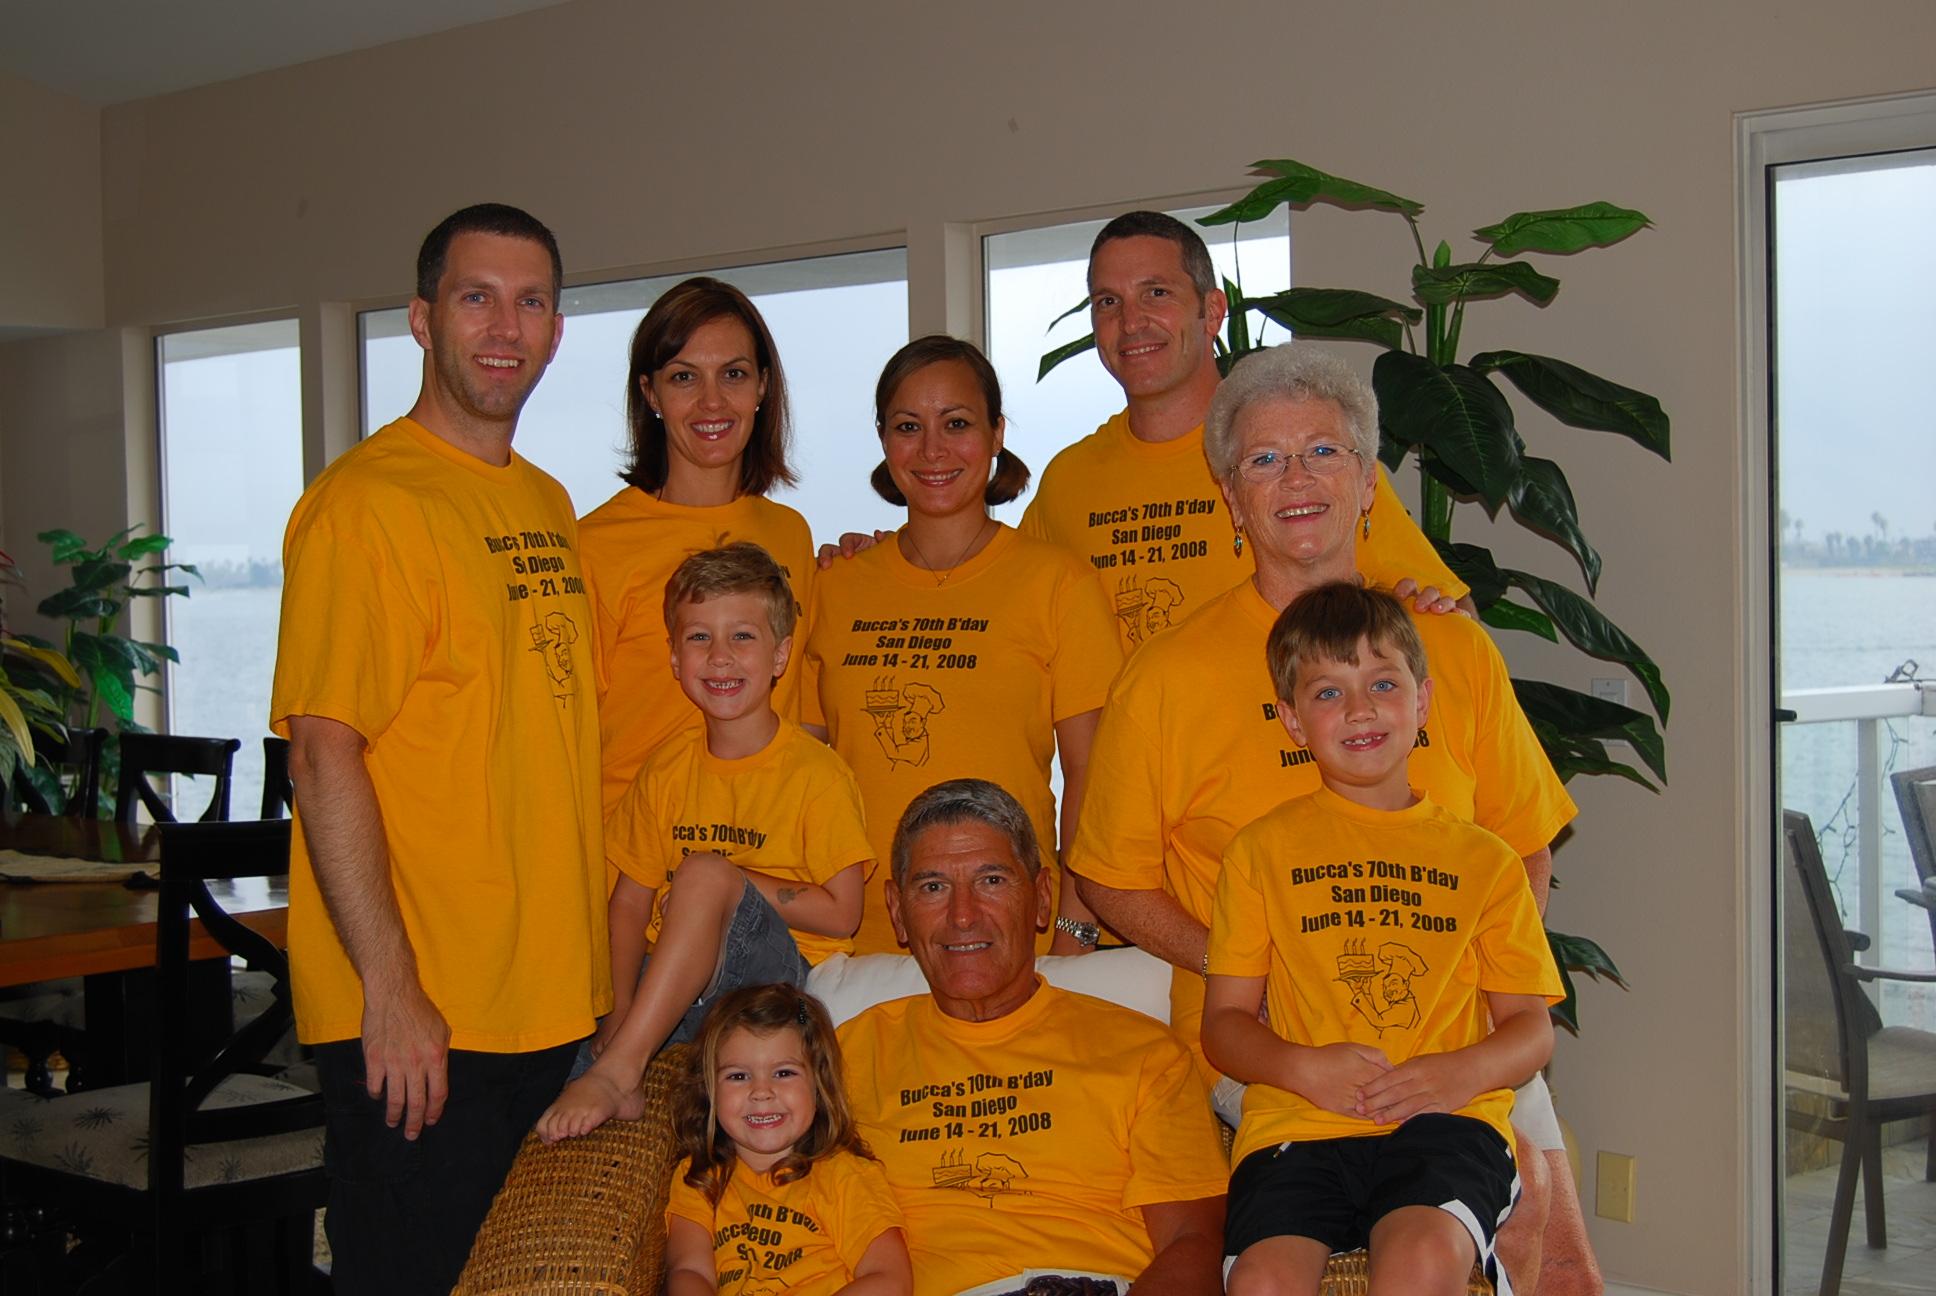 Shirt design san diego - The Ricotta Family Vacation T Shirt Photo